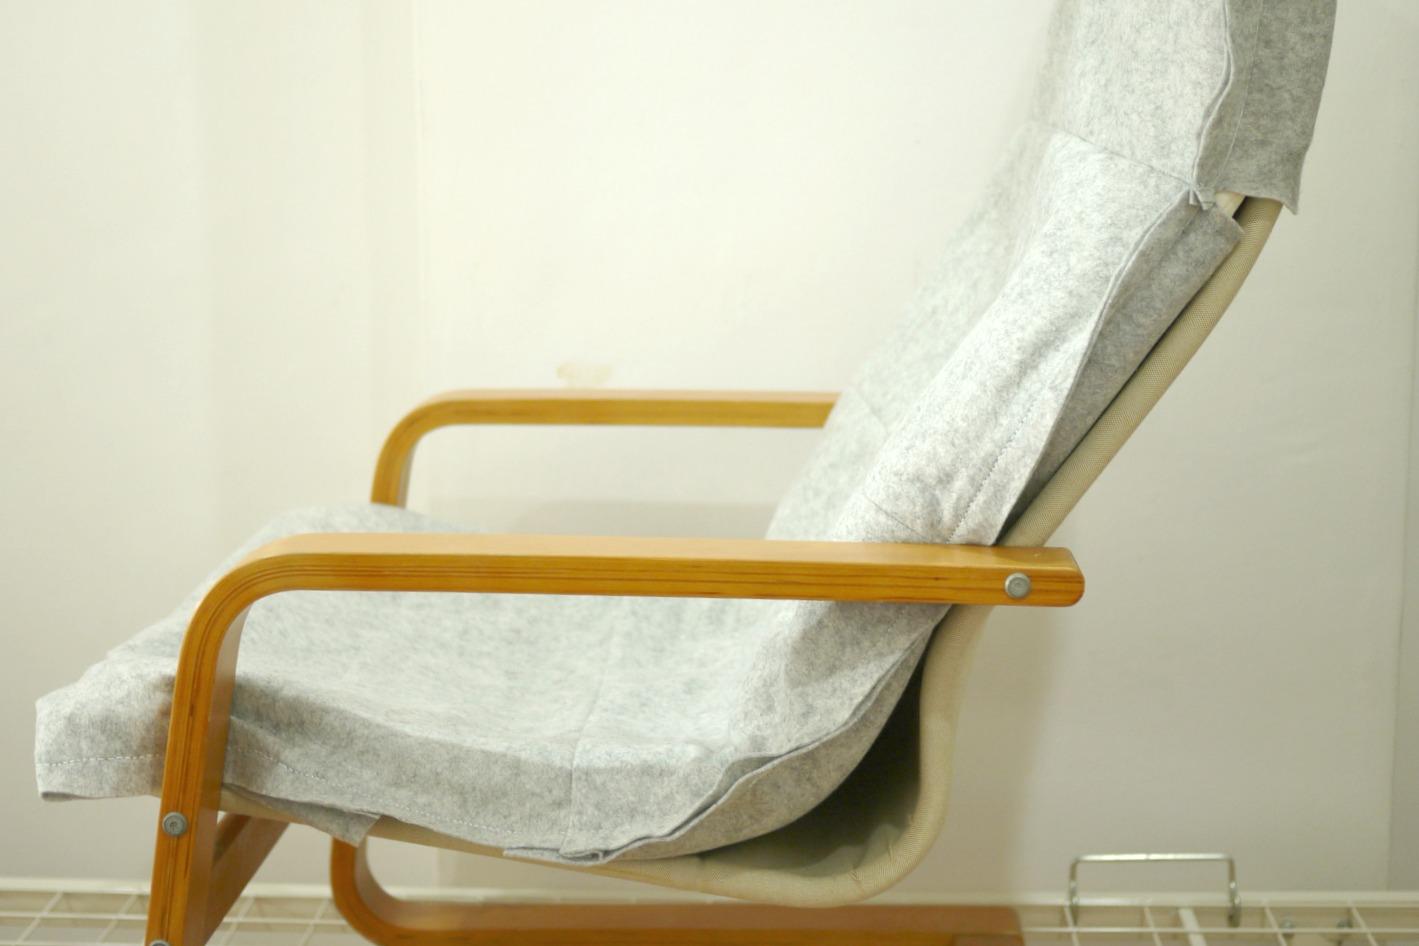 Superb Diy Ikea Pello Cover // Mono+co ...